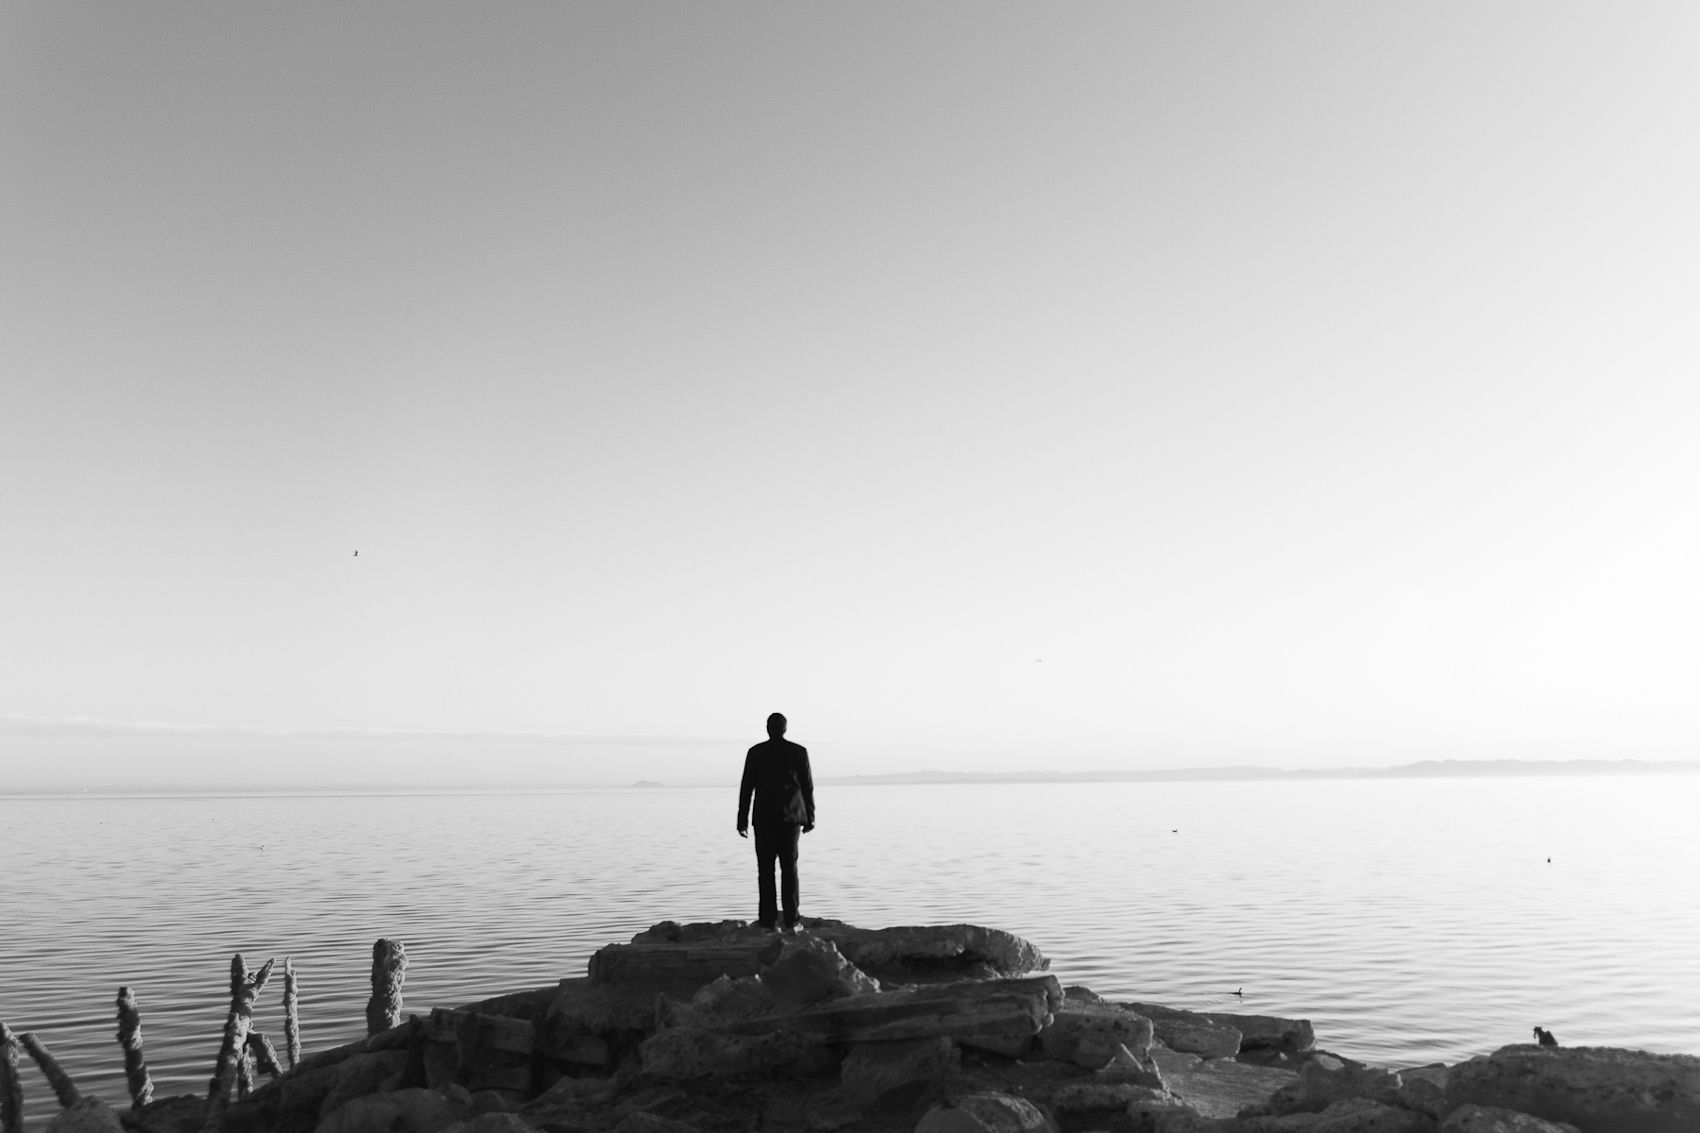 Self Portrait, Bombay Beach, Salton Sea, 2015